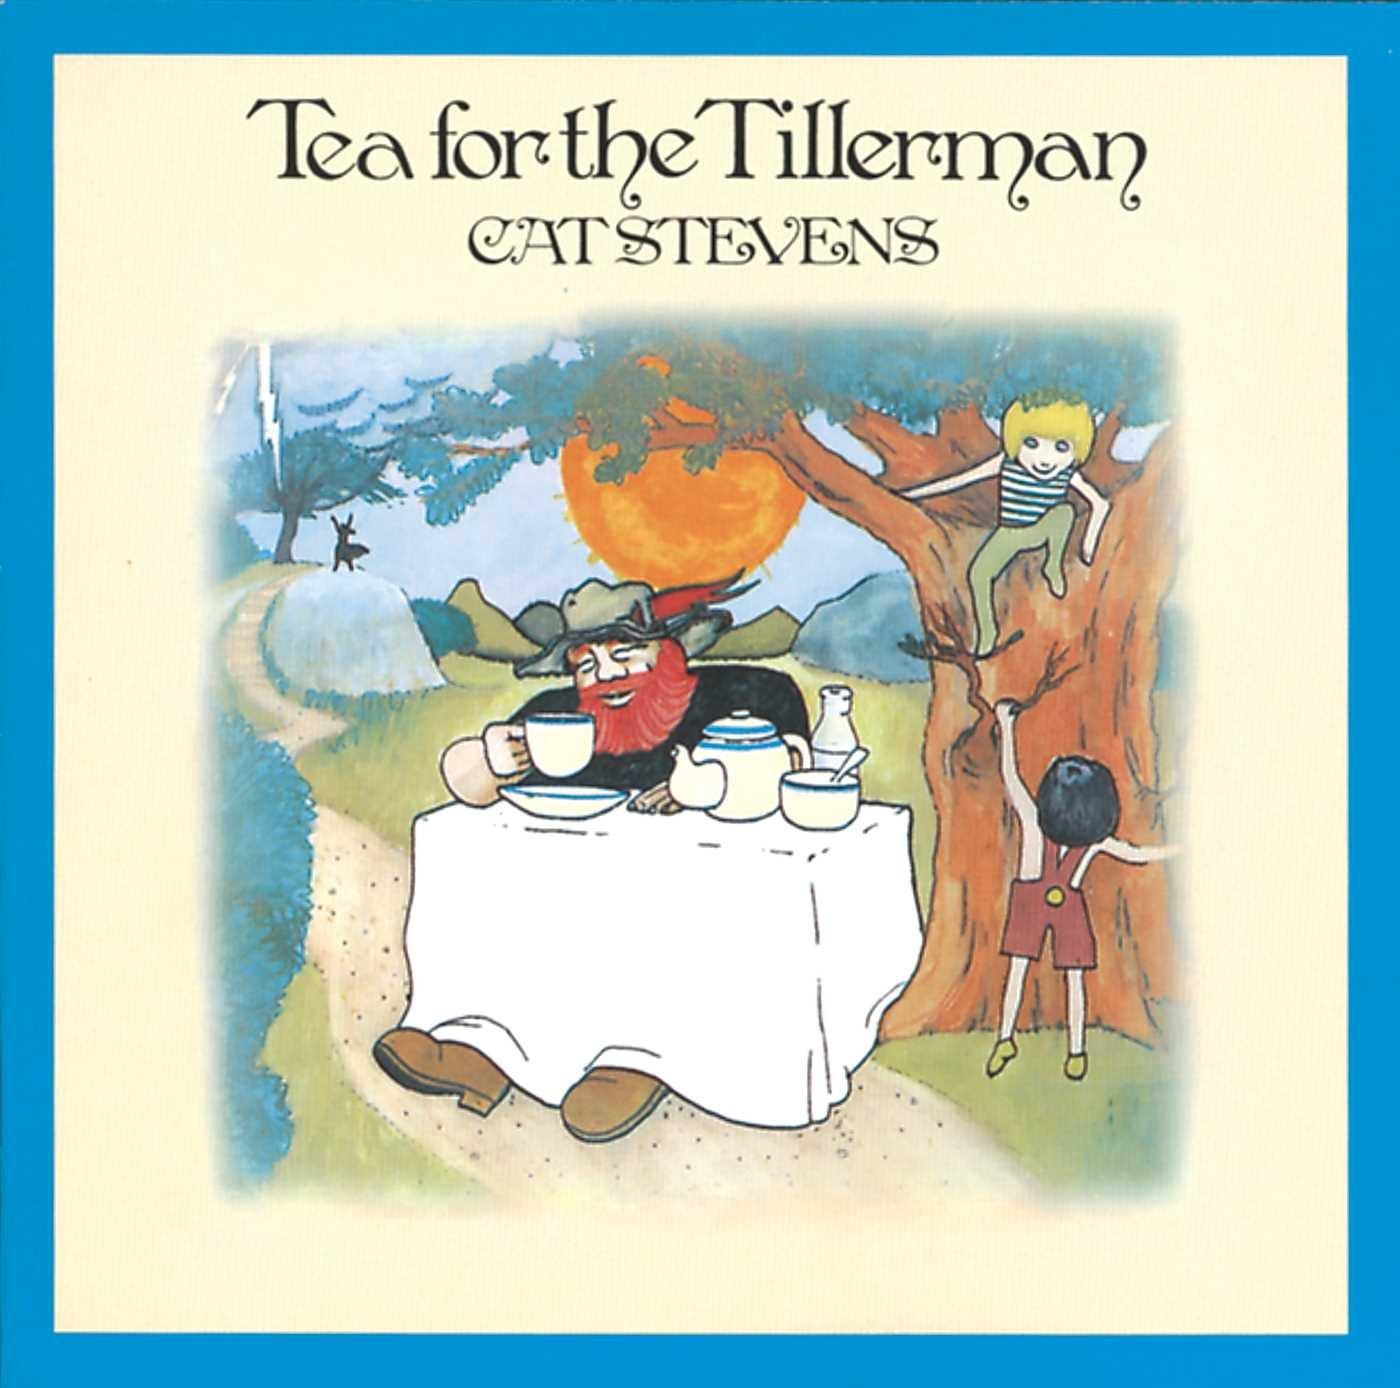 Tea for the Tillerman by Universal International